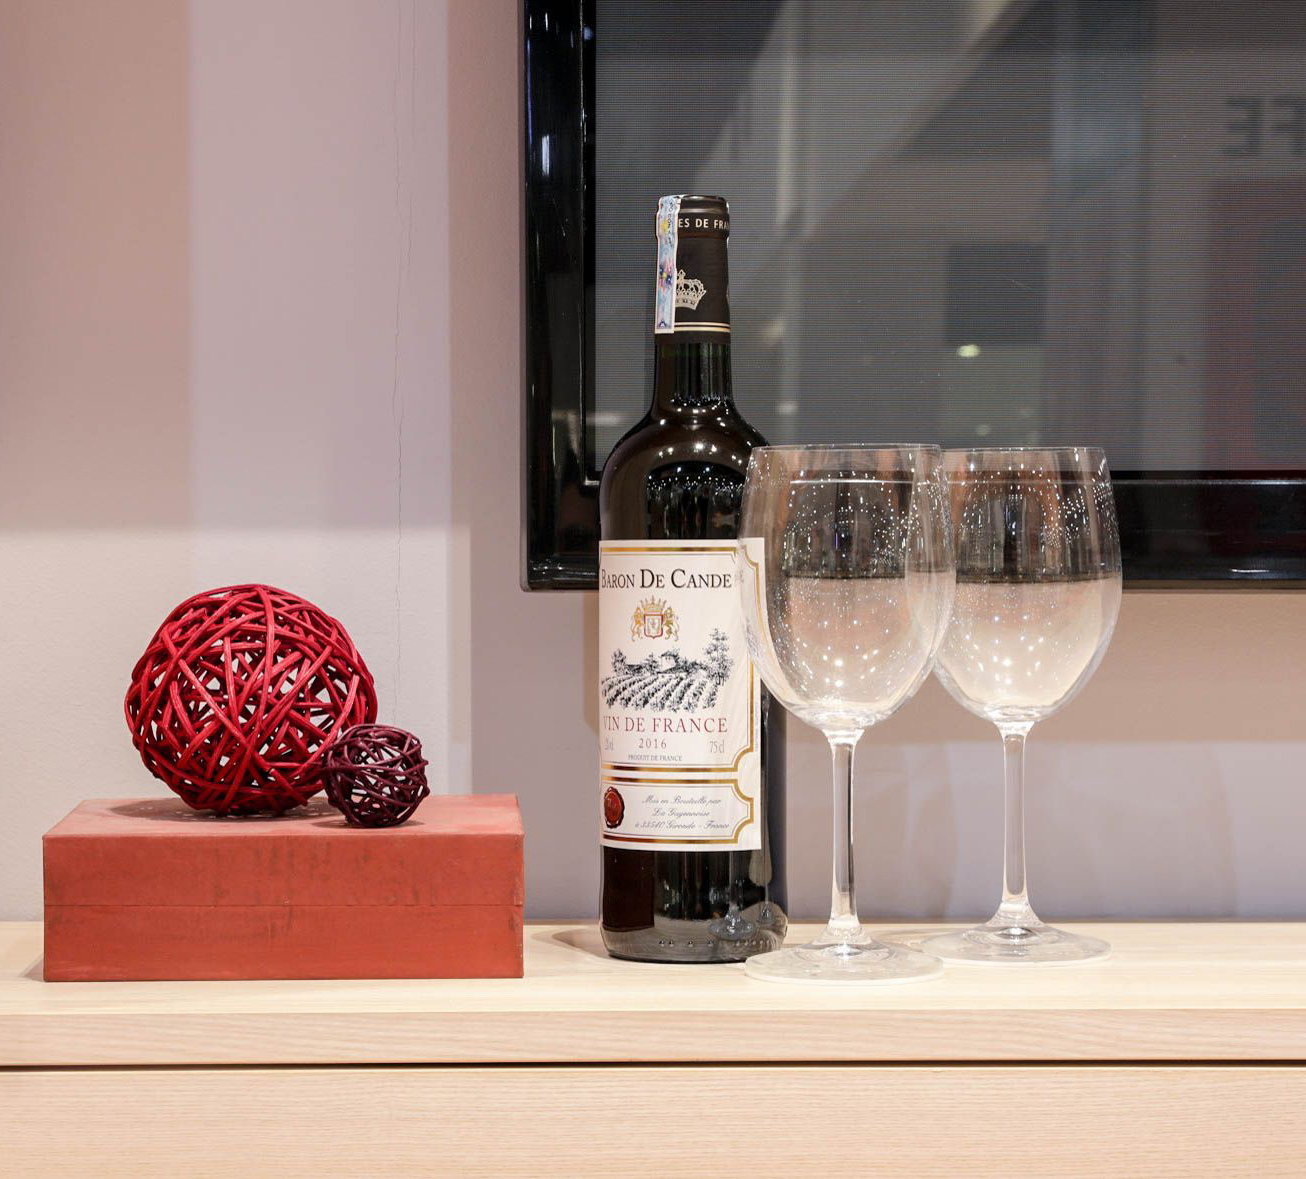 Rượu vang BARON DE CANDE Vin De France